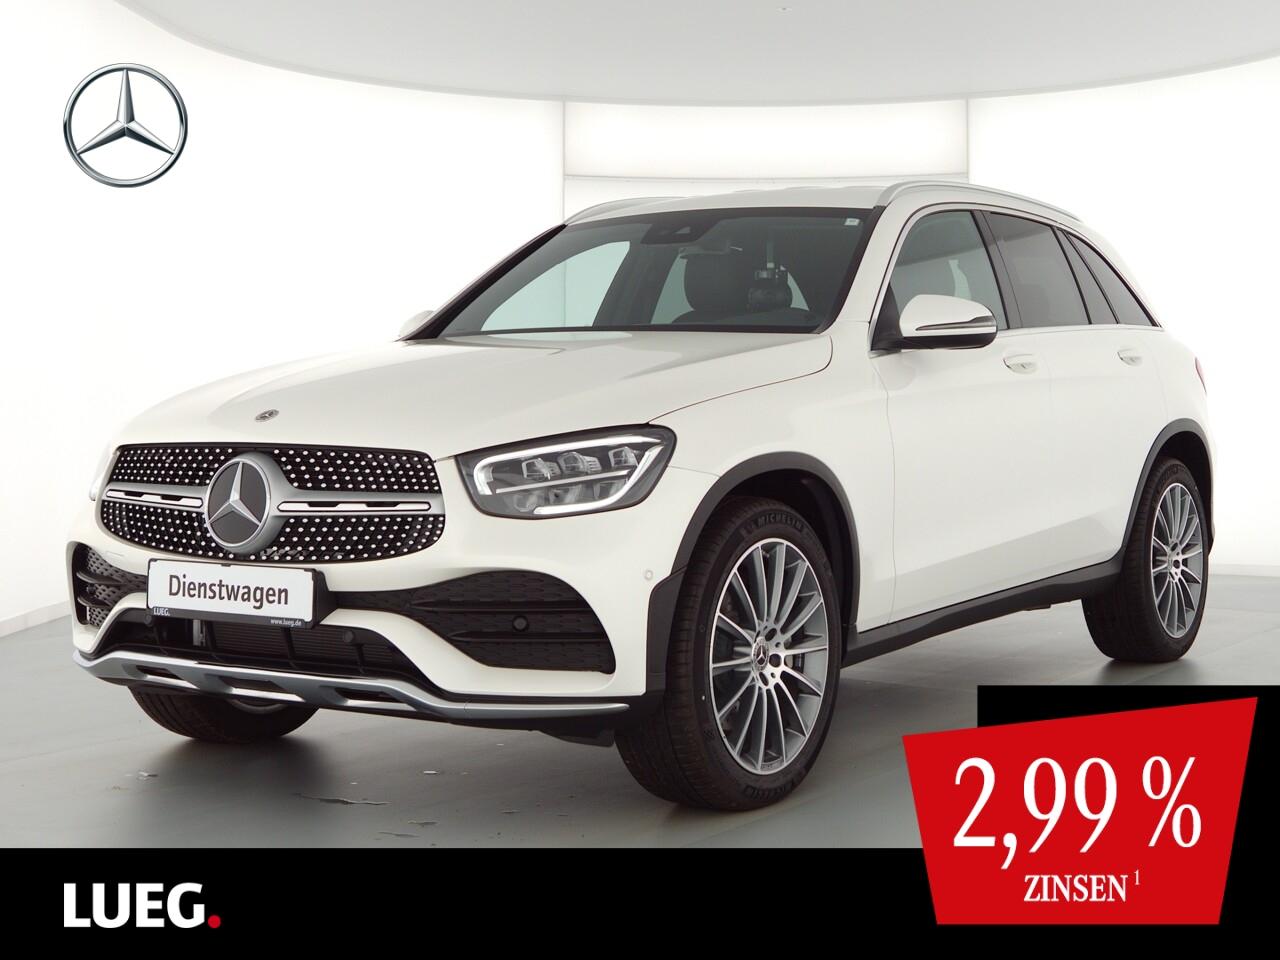 Mercedes-Benz GLC 300 d 4M AMG+LED+AHK+Kamera+PDC, Jahr, Diesel